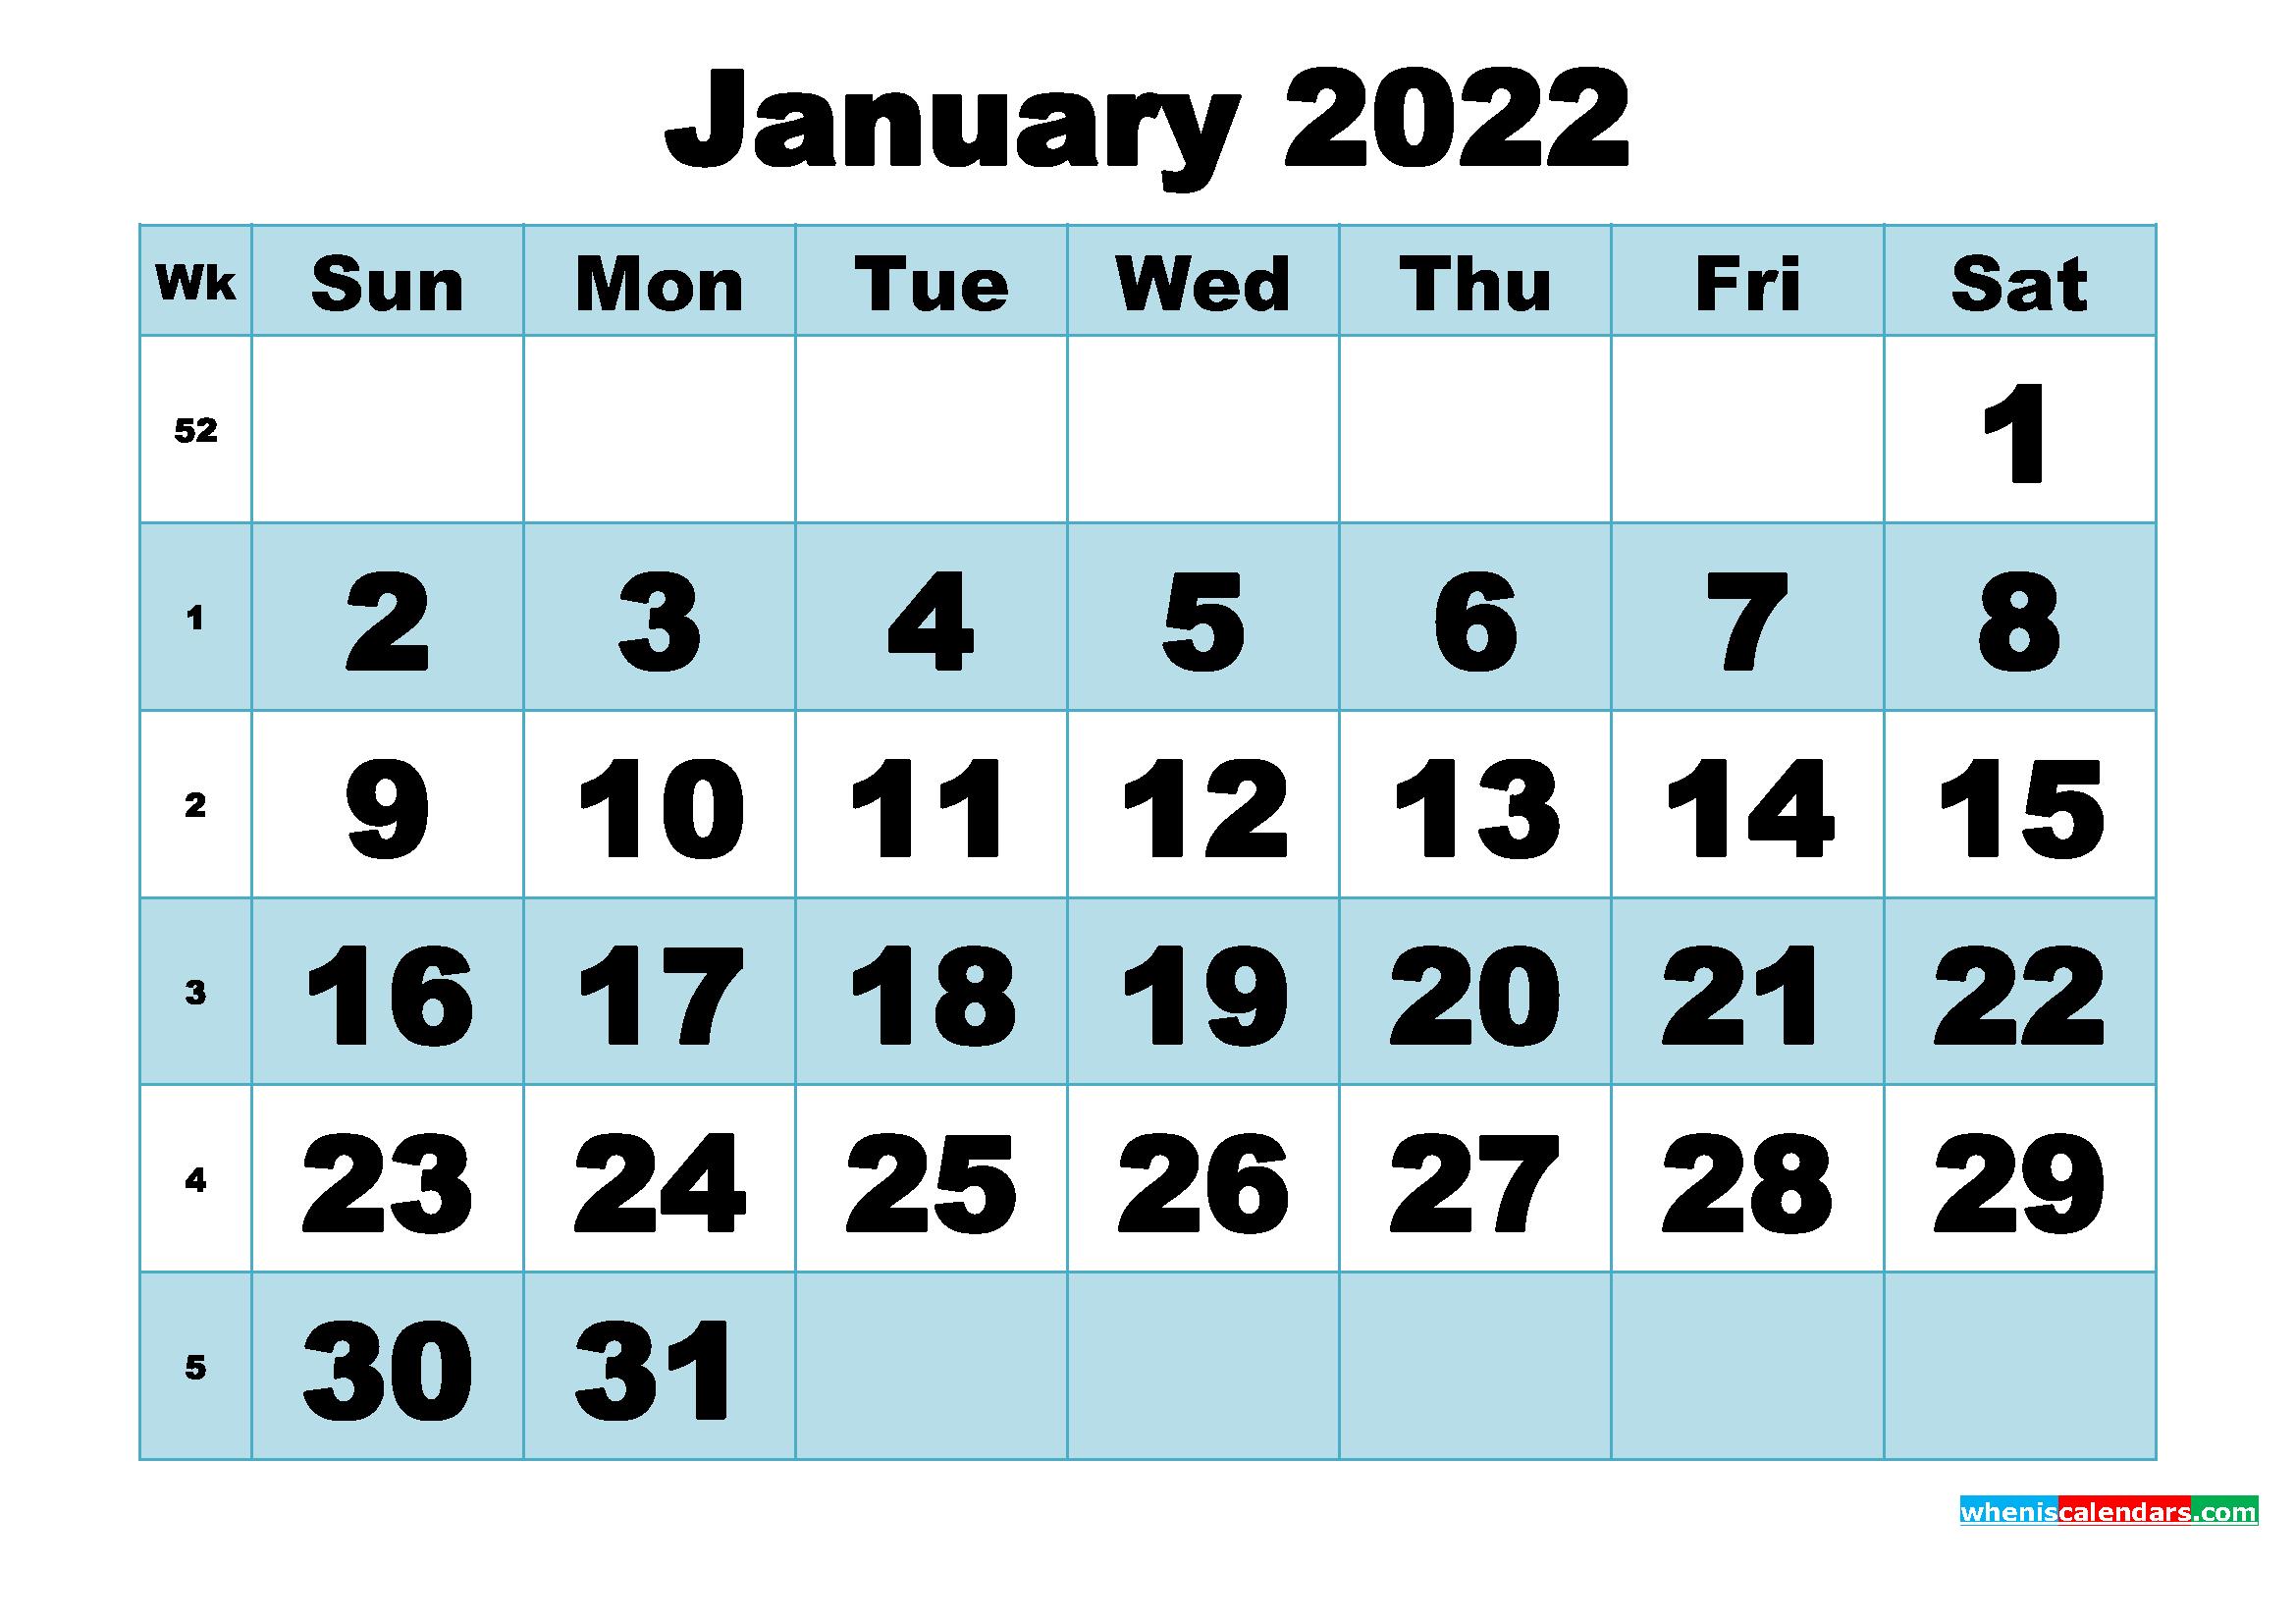 Free Printable January 2022 Calendar Word, PDF, Image ...